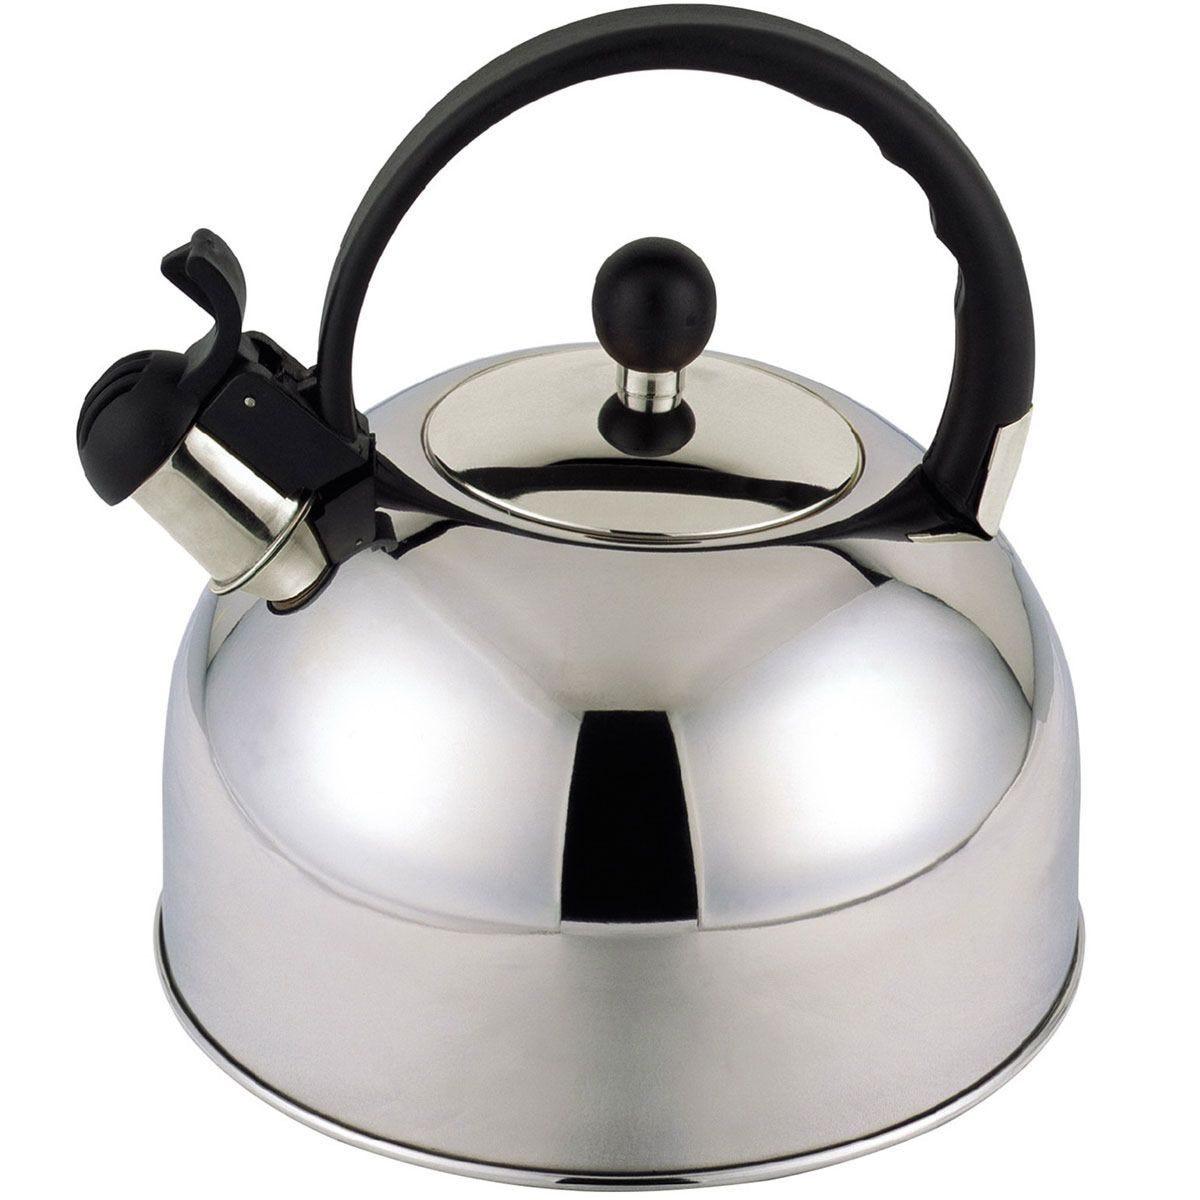 Sabichi Essential 2.5L Whistling Kettle